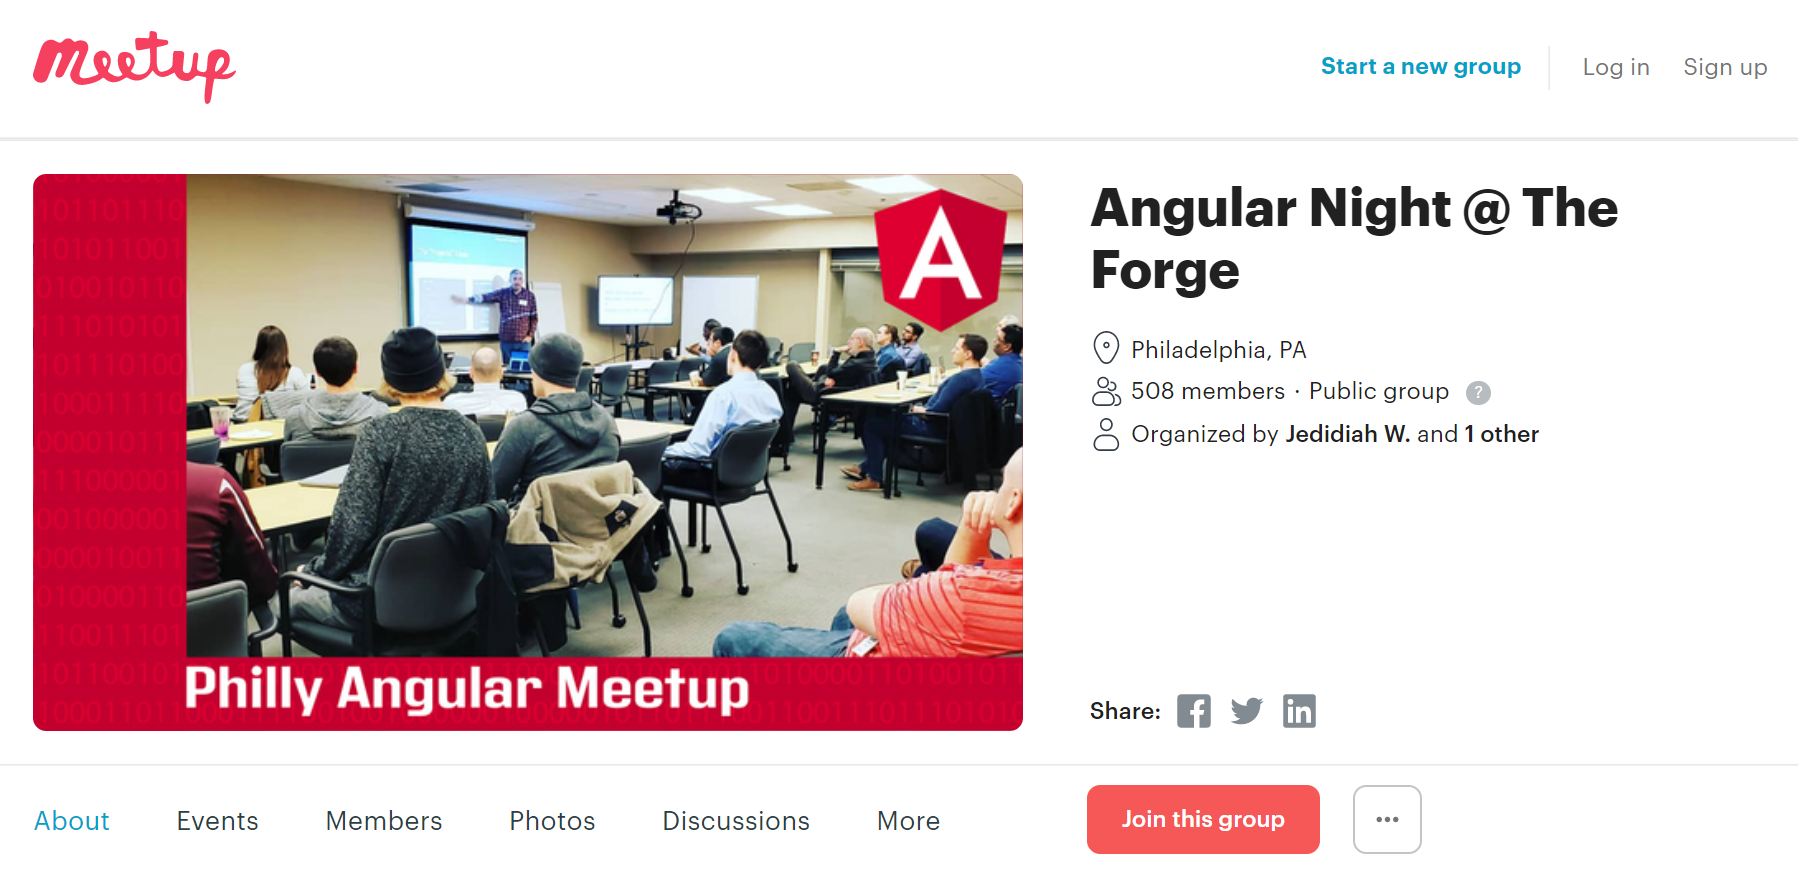 Top 10 Active Meetup Groups In Tech & Entrepreneurial Scene - Fig 3